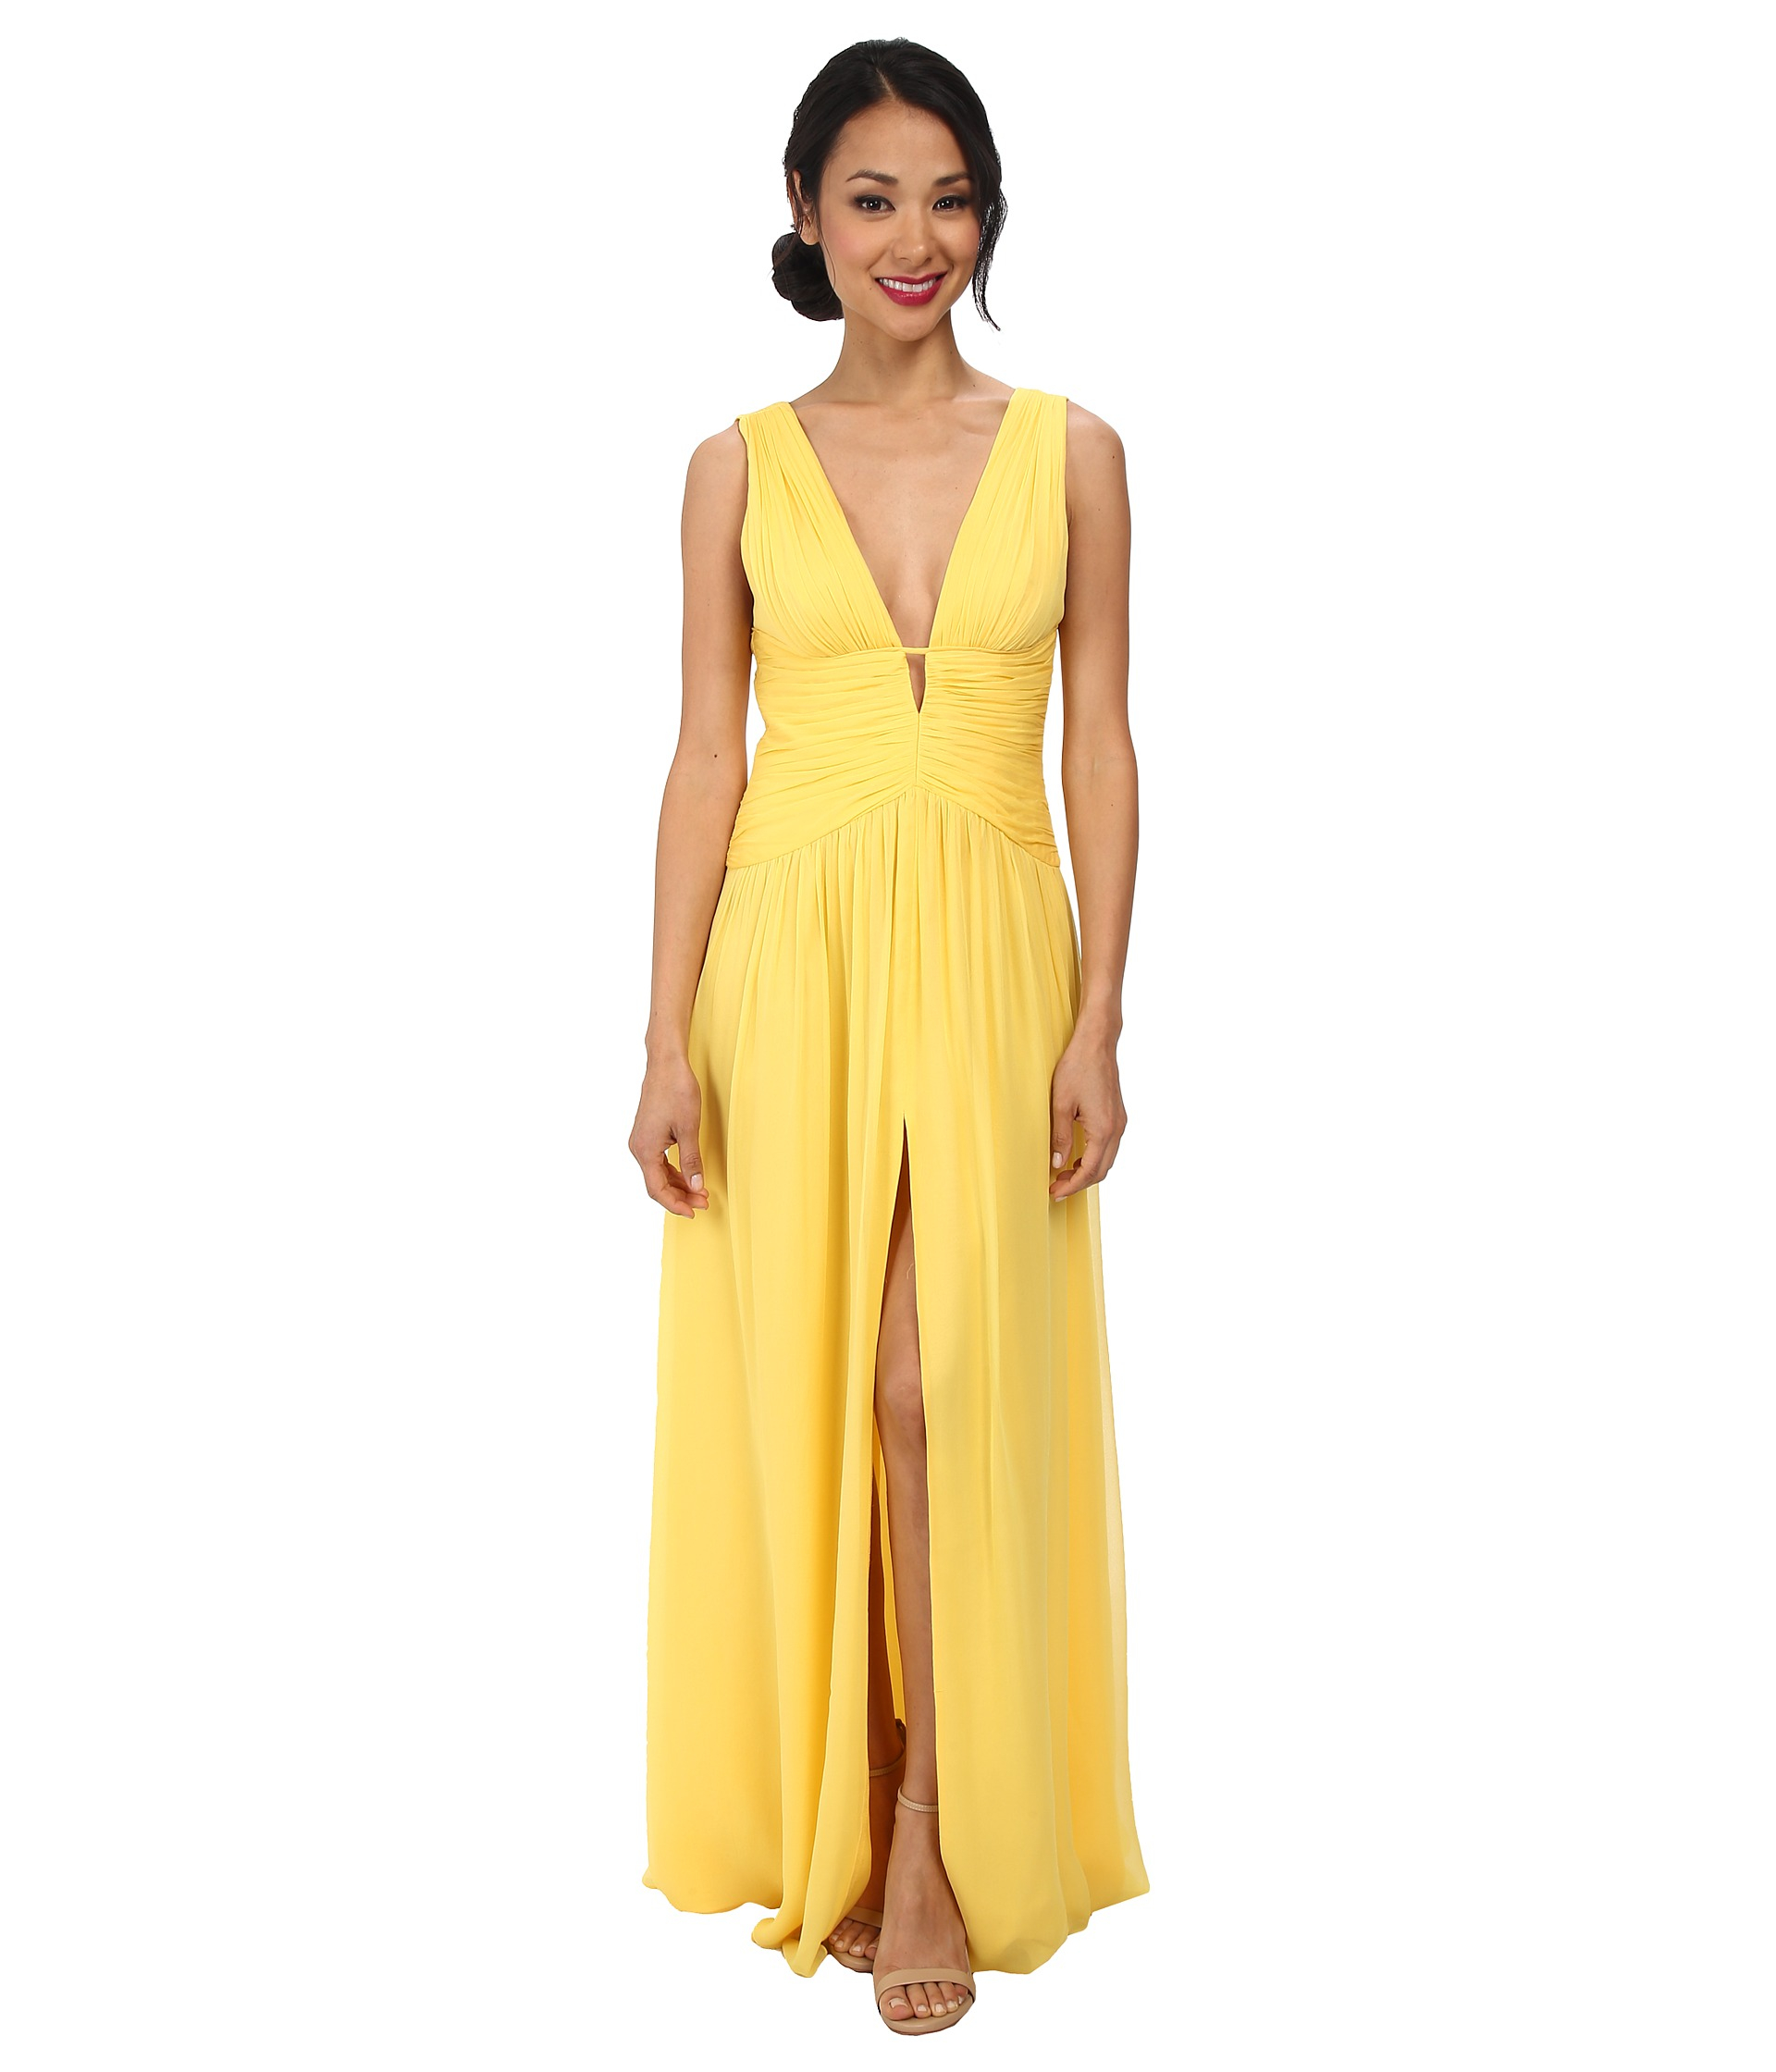 Yellow deep v-neck dress